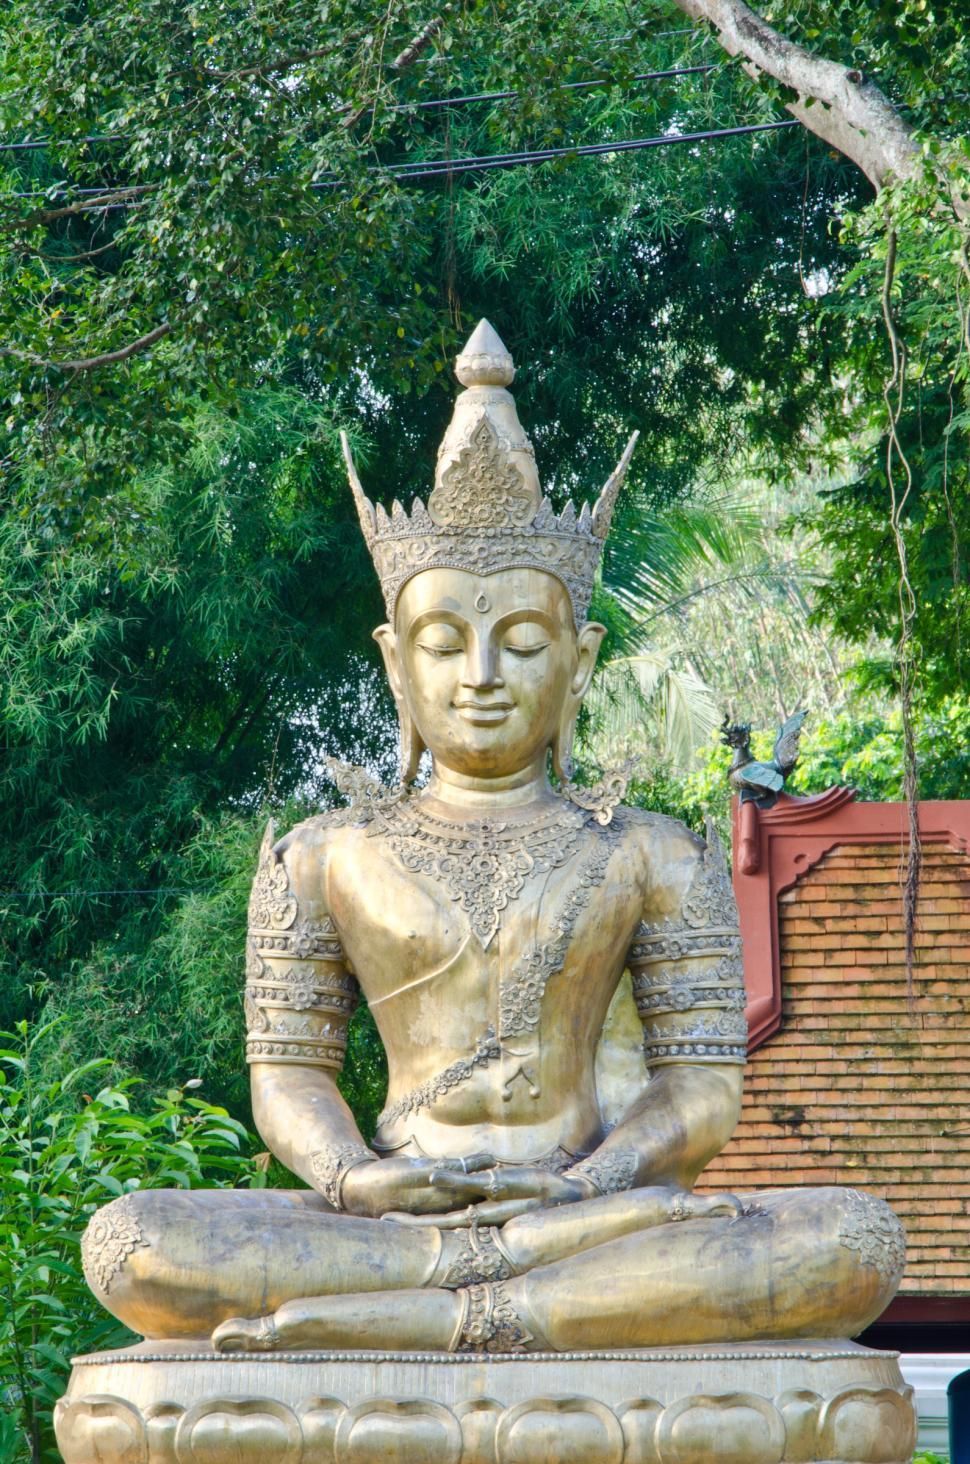 Download Free Stock HD Photo of Buddha Images - Buddha Meditation Online